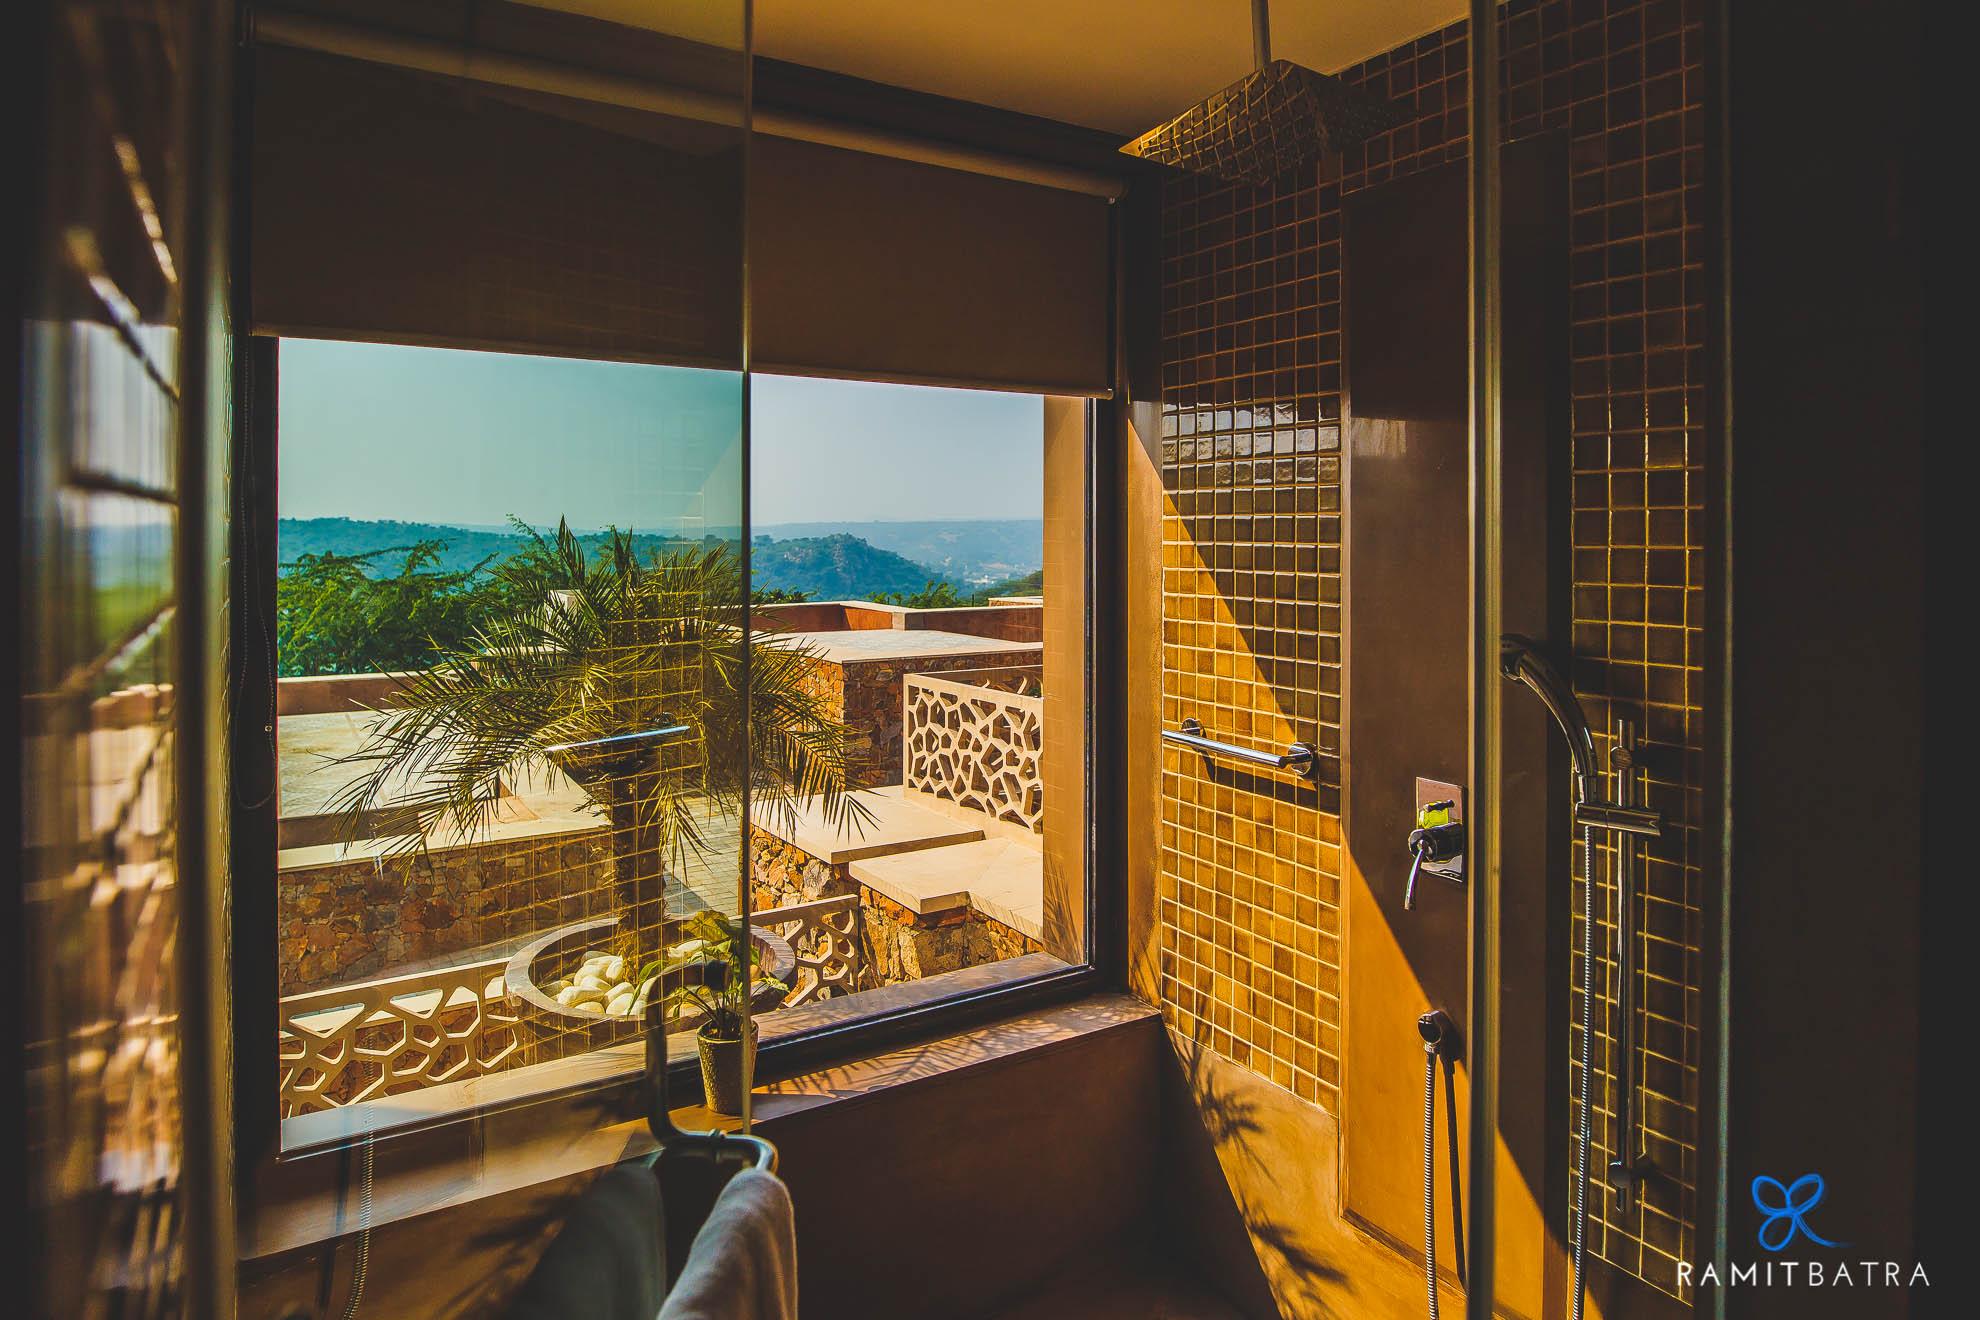 lalit-mangar-hotel-near-delhi-ramitbatra-008